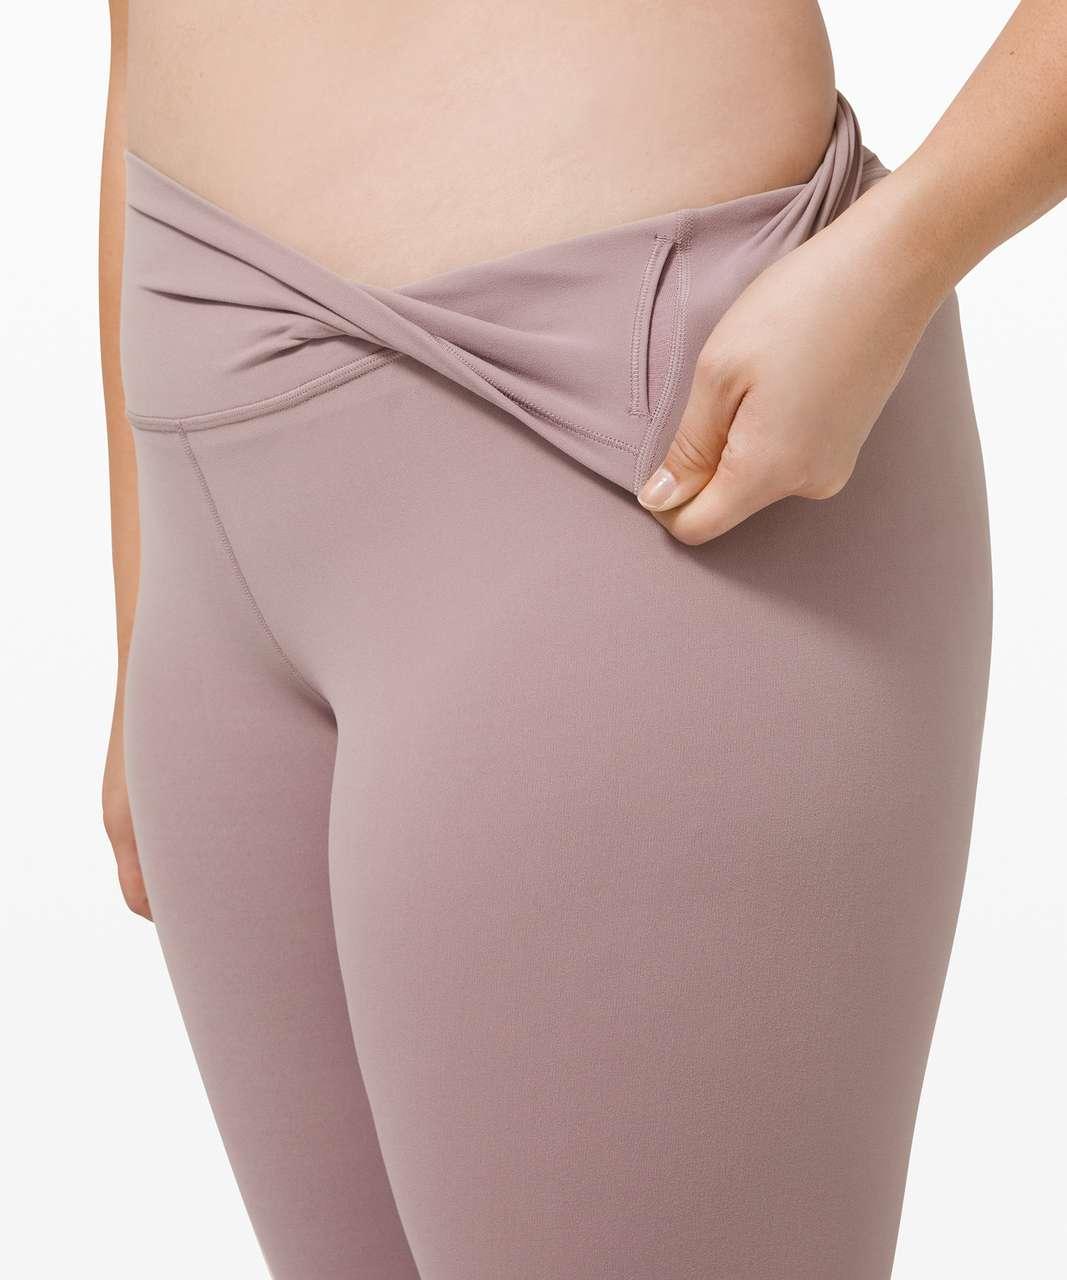 "Lululemon Align Pant II 25"" - Violet Verbena"